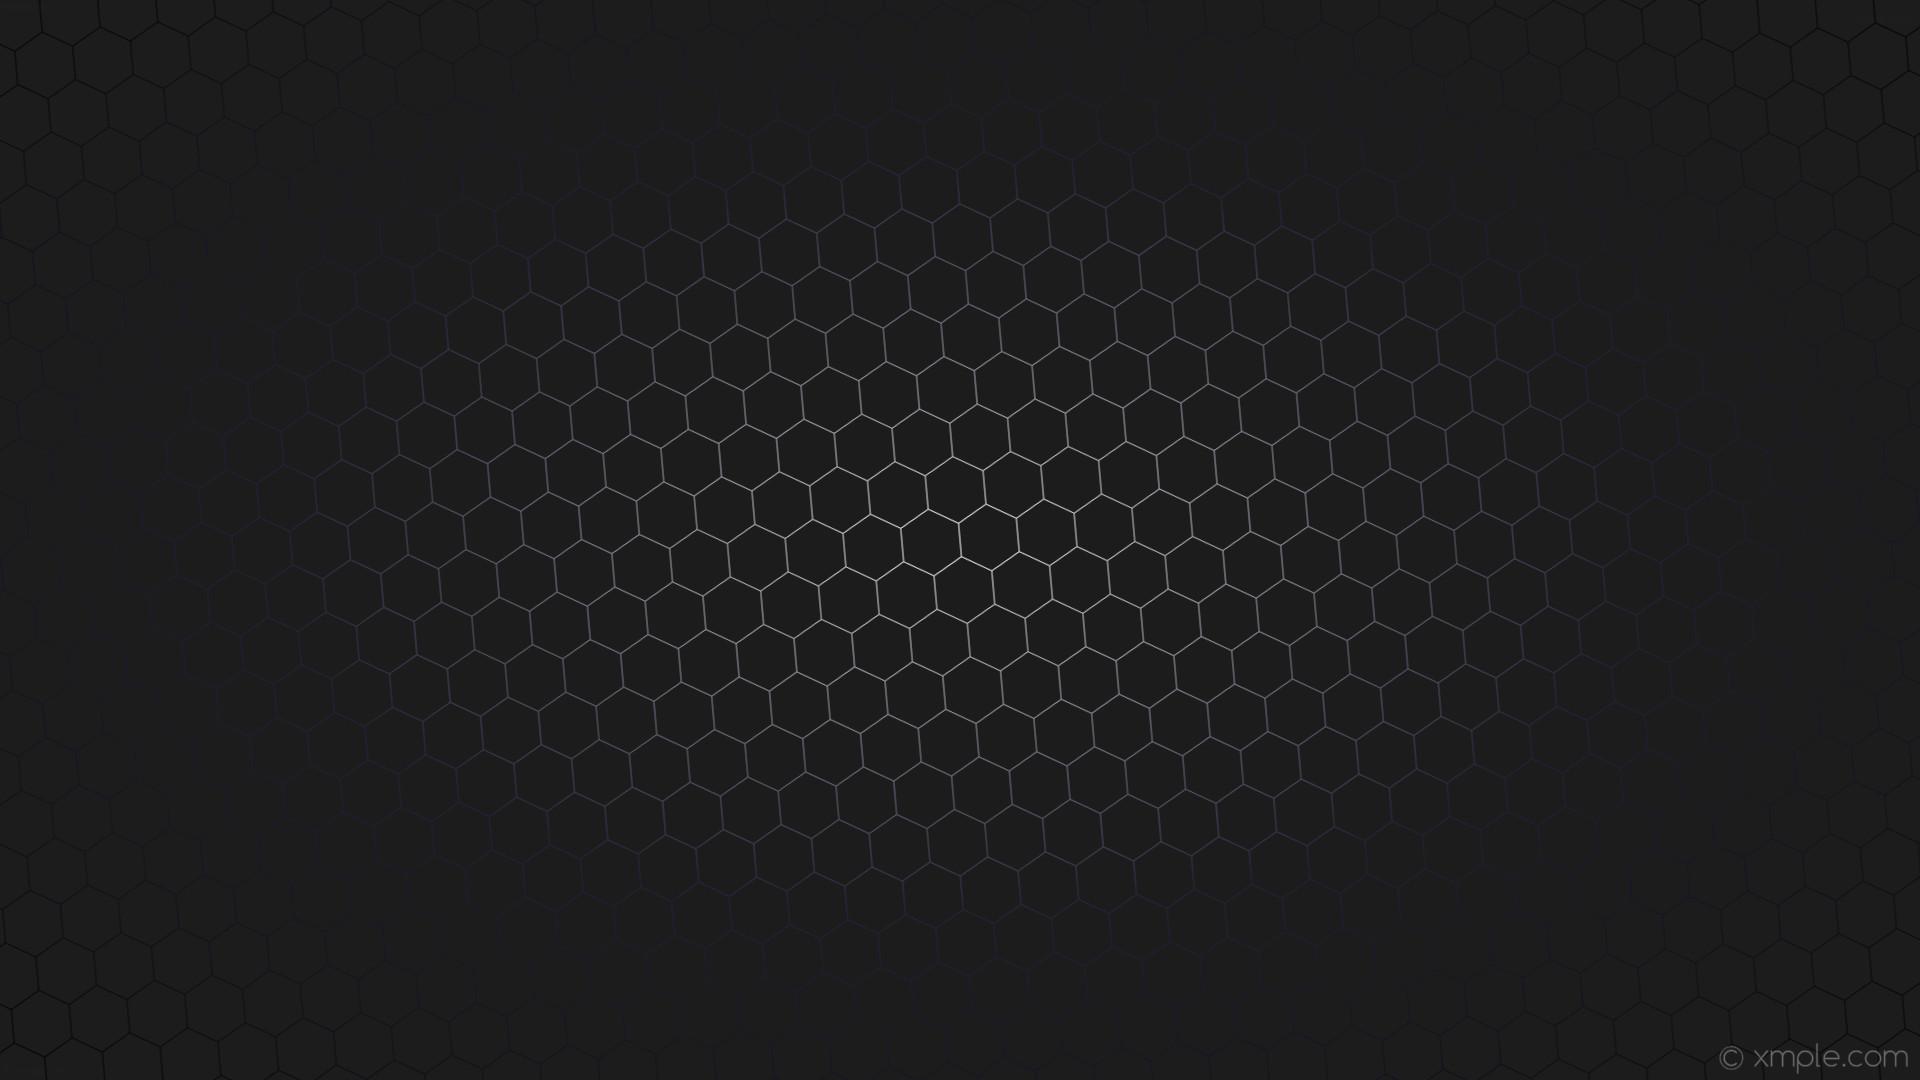 wallpaper glow gradient hexagon gray black blue white dark gray dark blue  #1c1c1d #ffffff